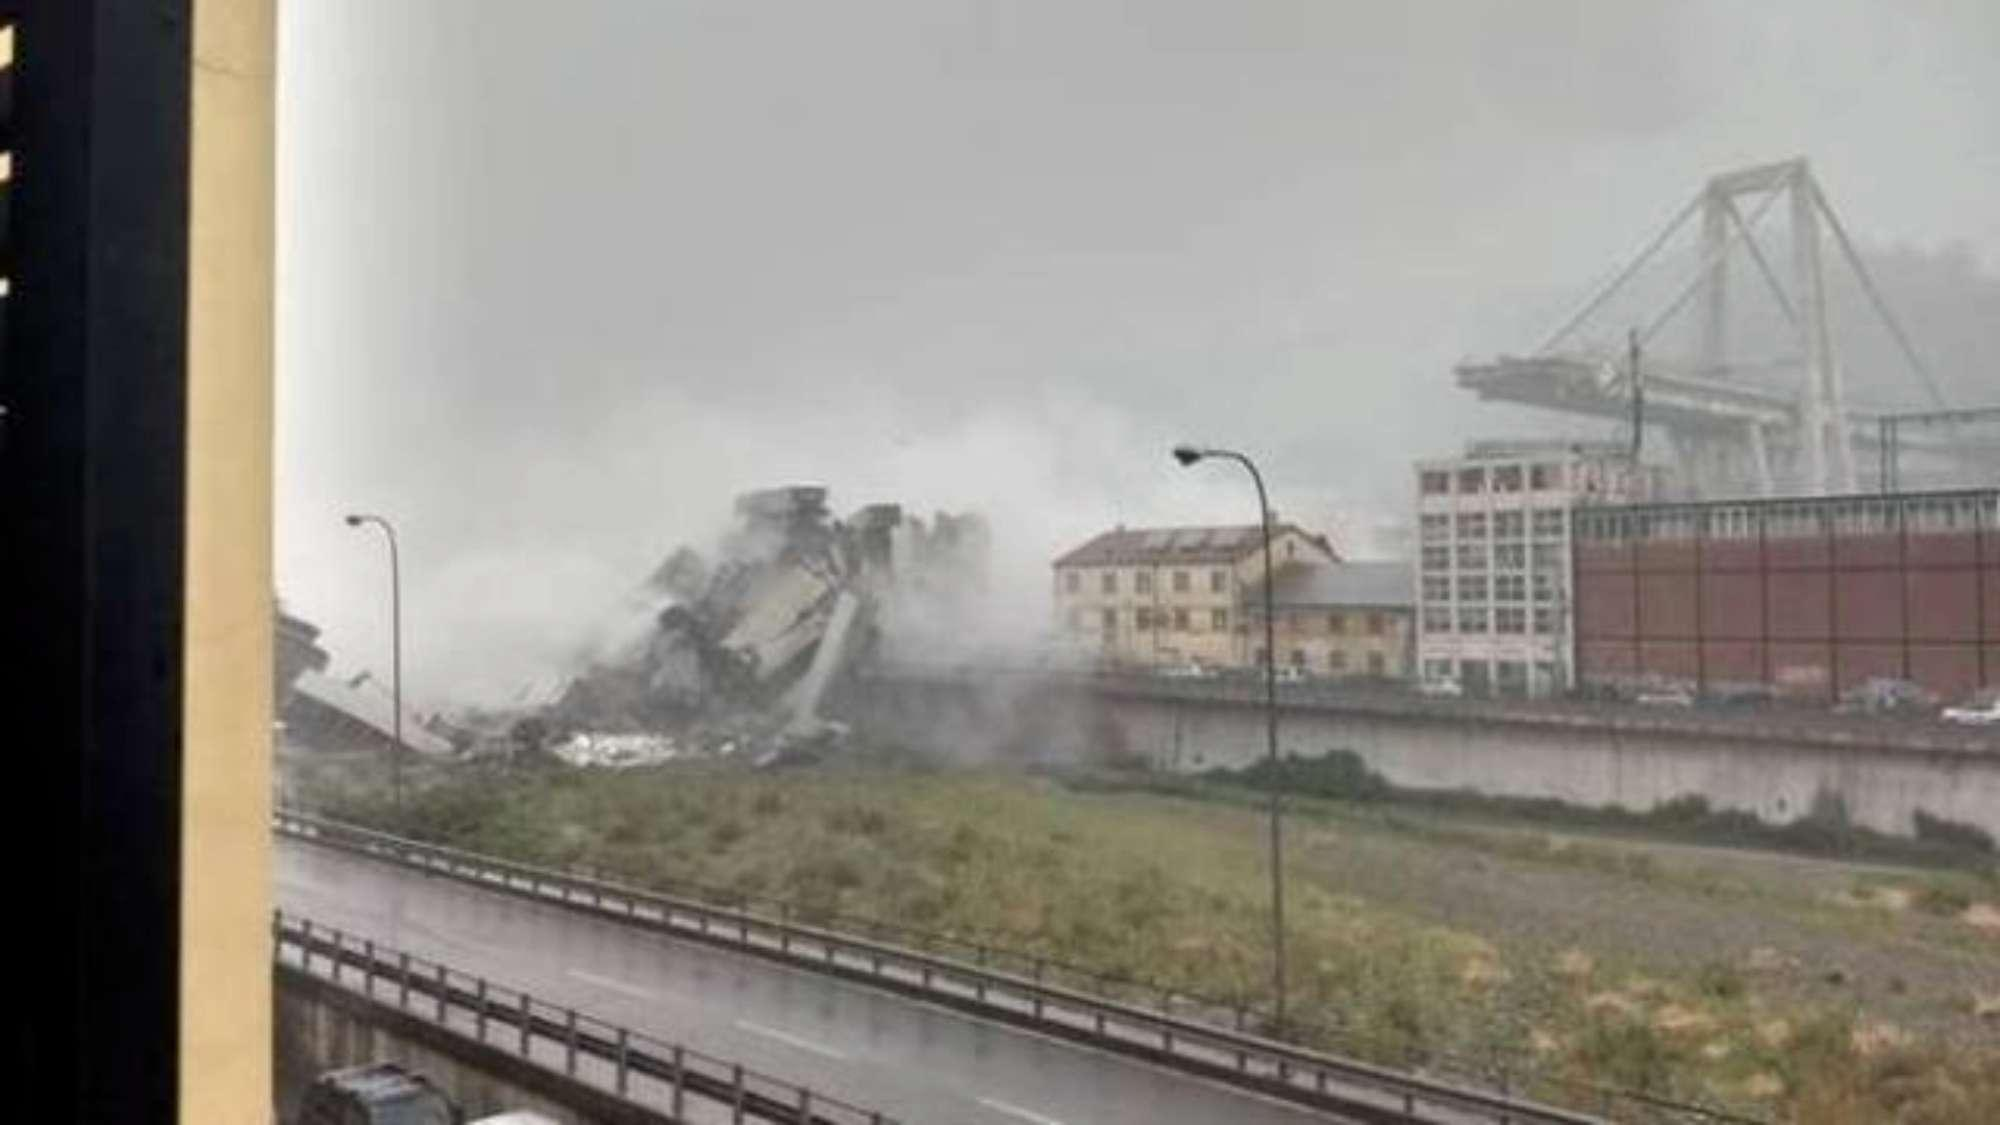 Crolla ponte su autostrada A10 a Genova